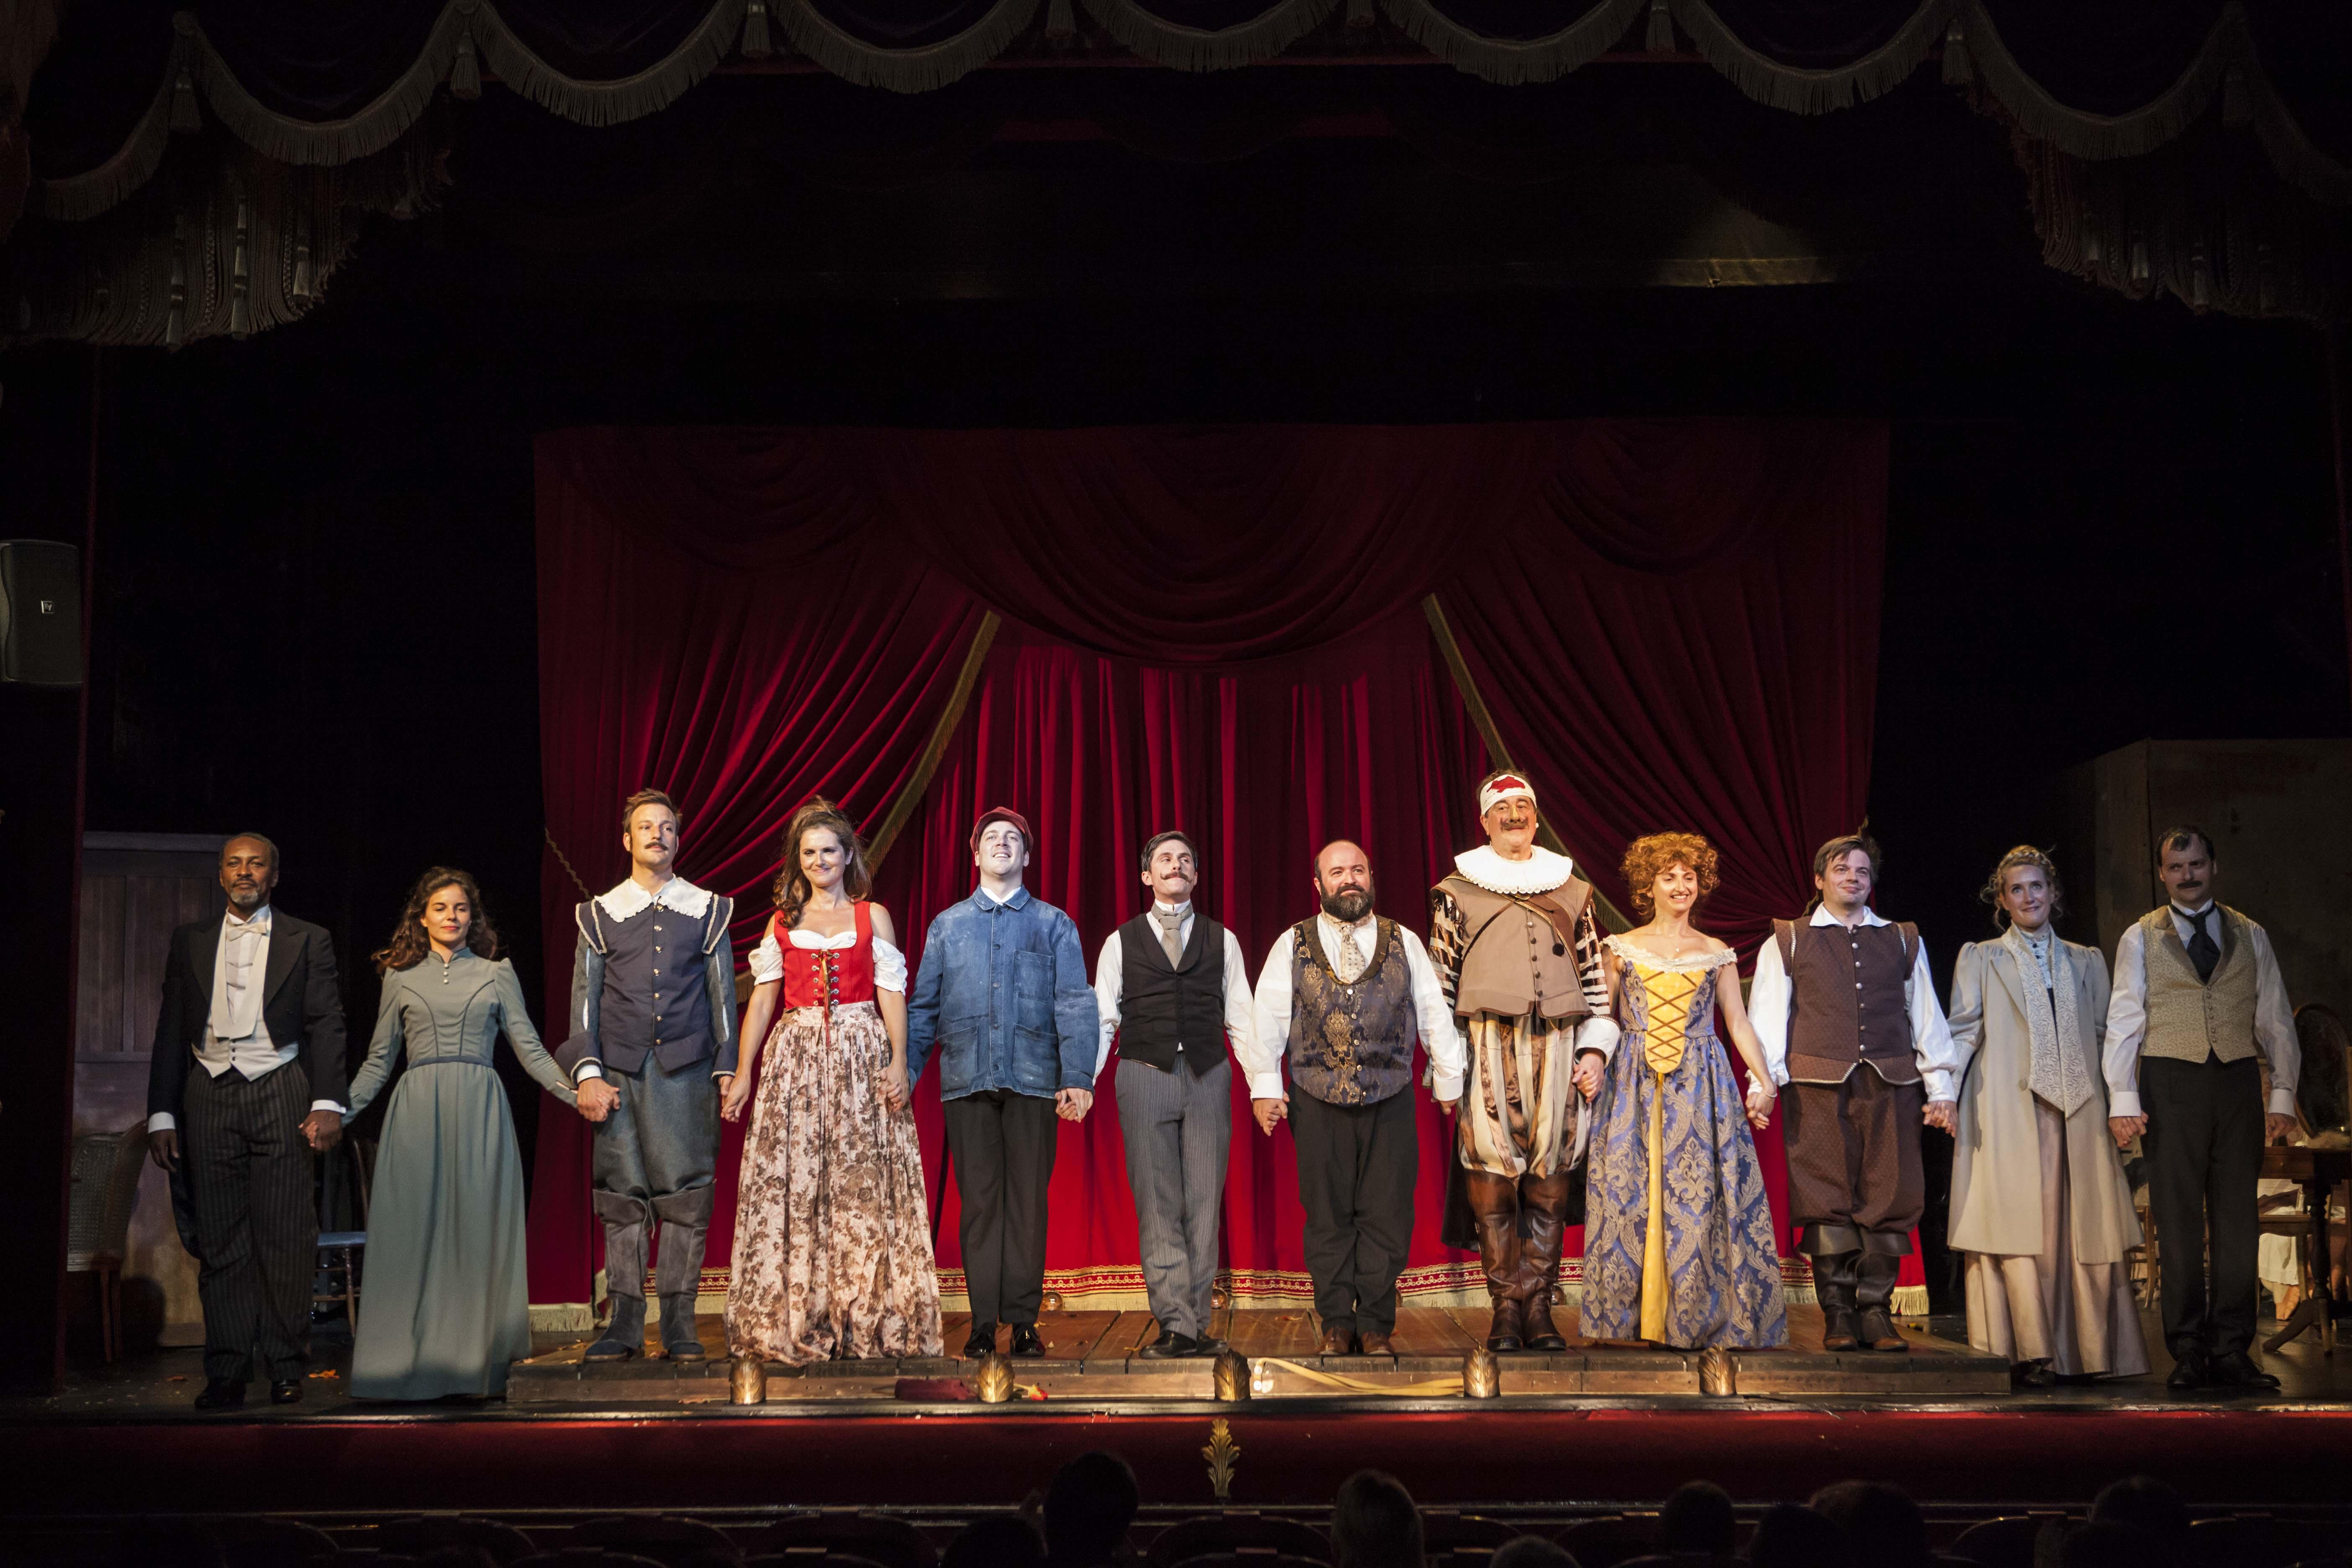 Edmond theatre palais royal